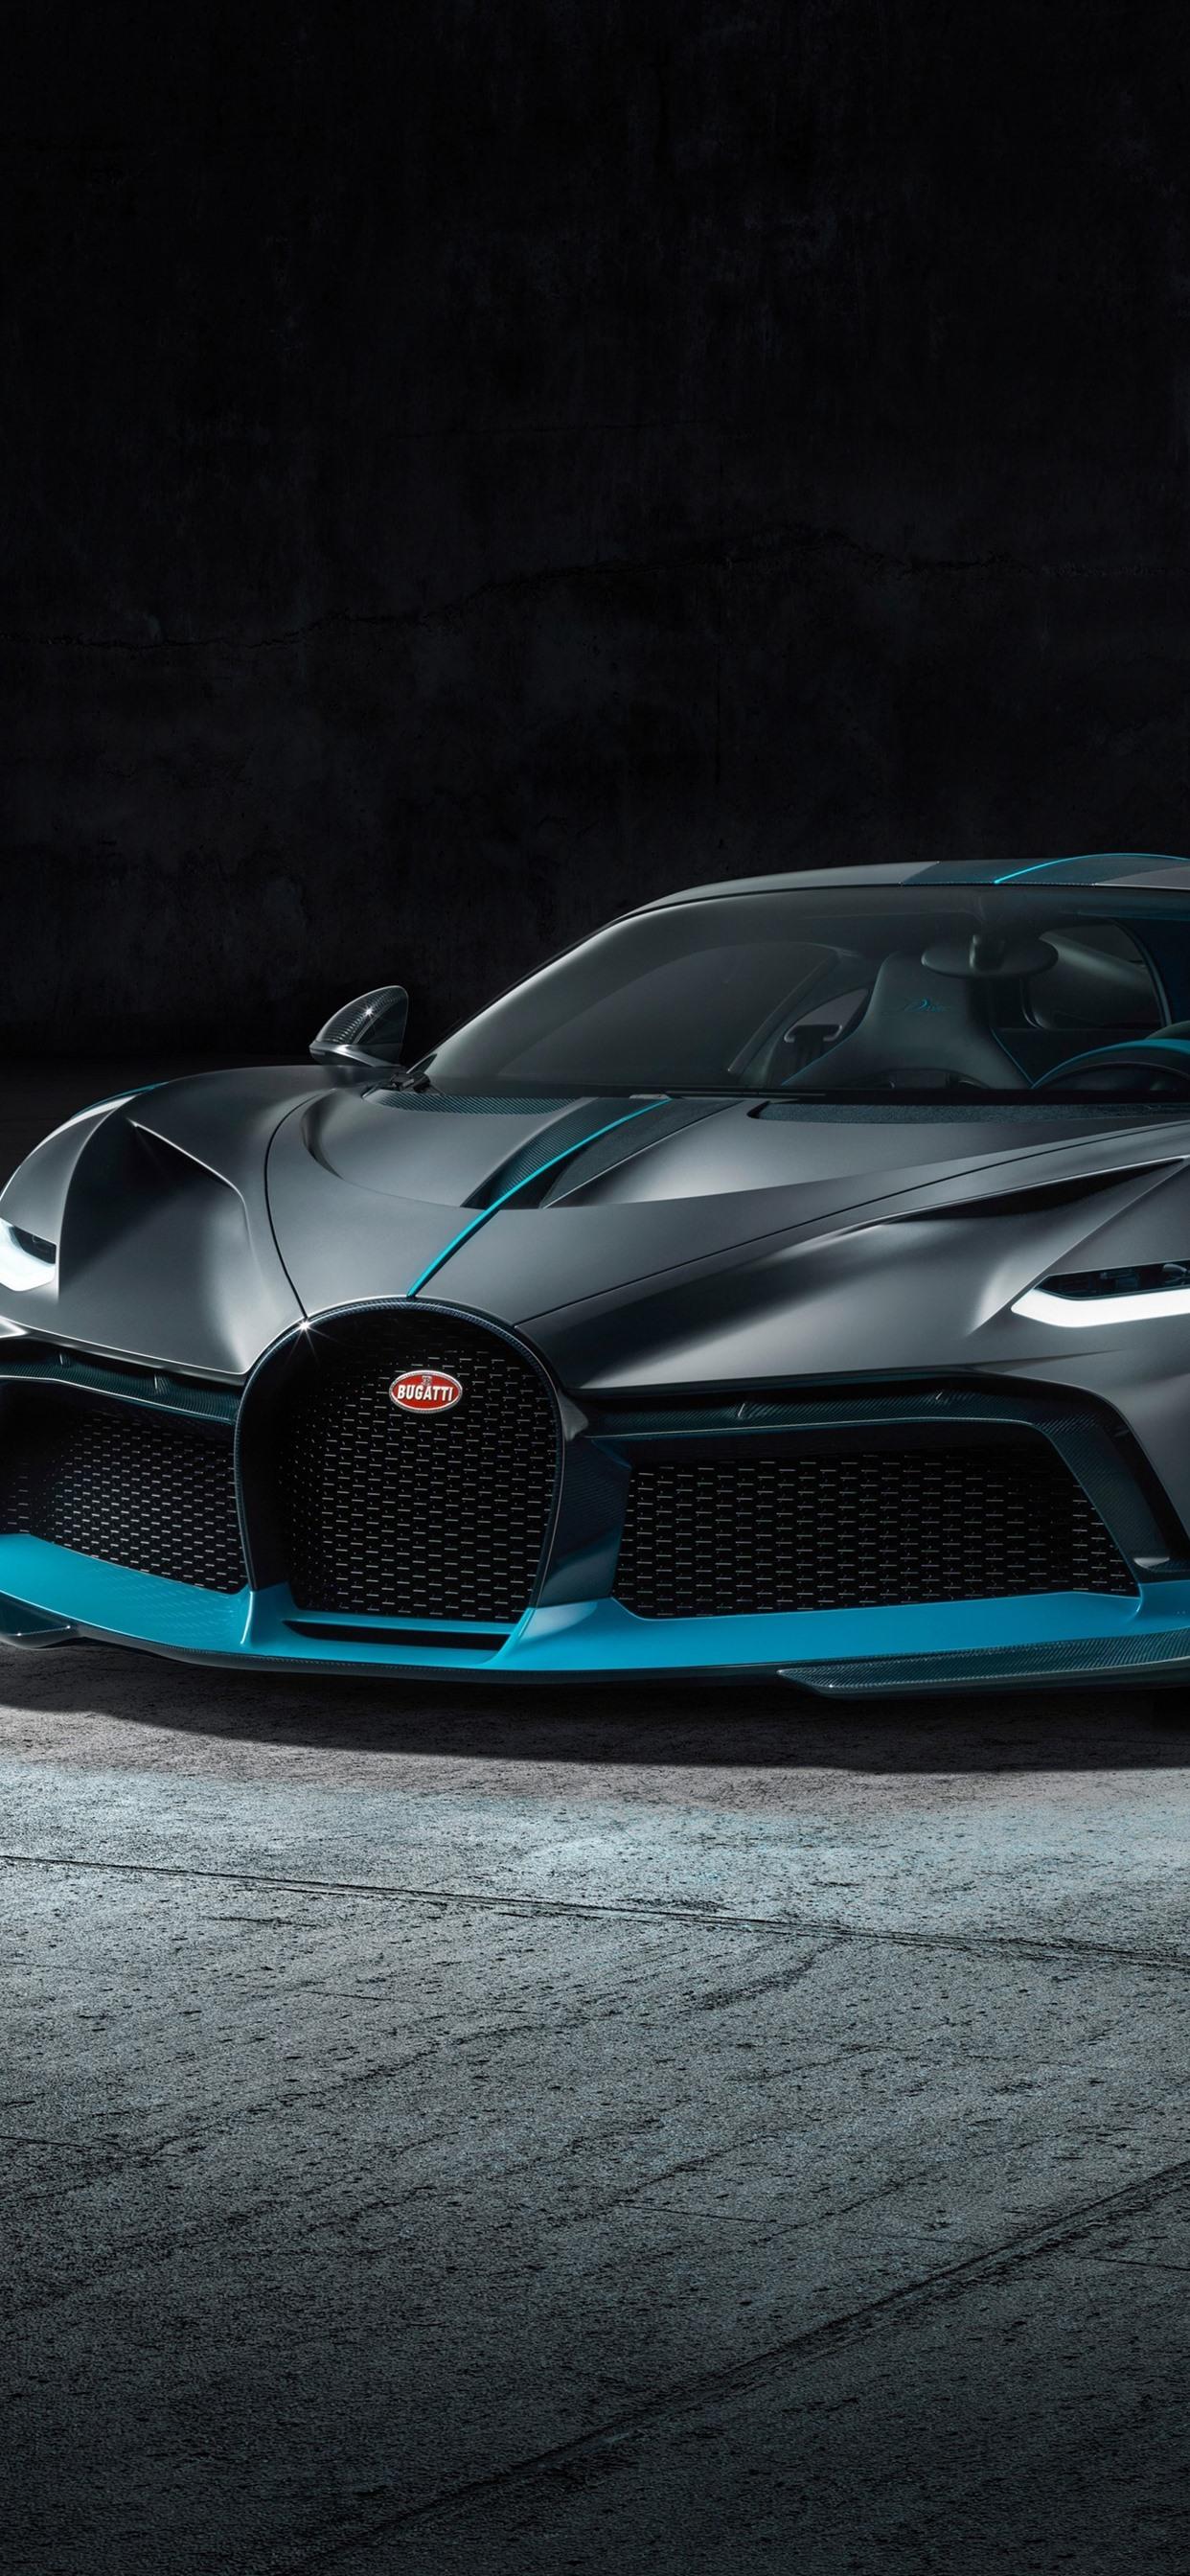 2019 Bugatti Divo Black Supercar Front View 1242x2688 Iphone